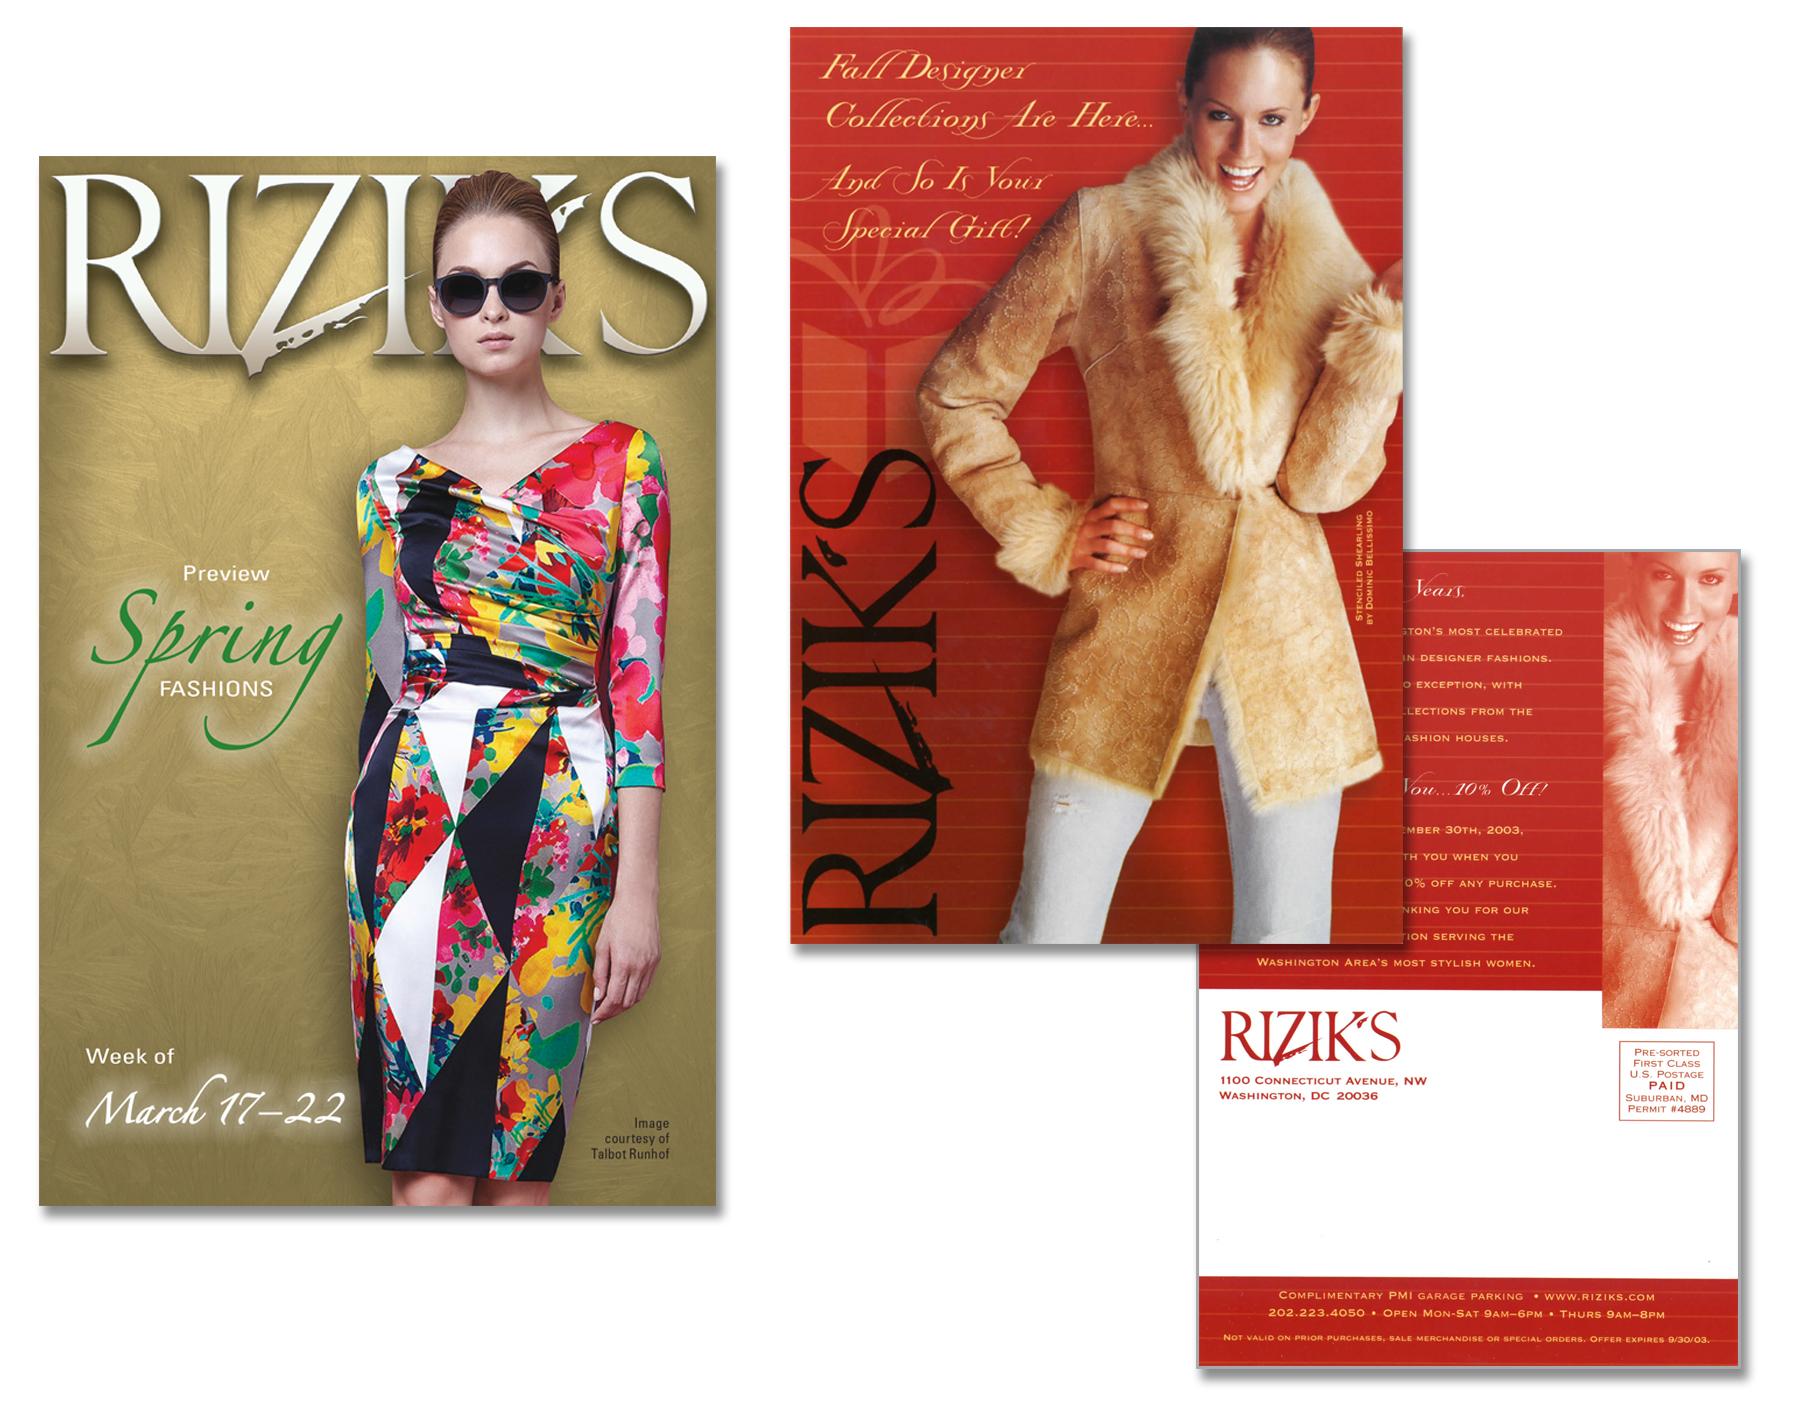 Rizik's, High-End Apparel, Various Postcard Campaigns